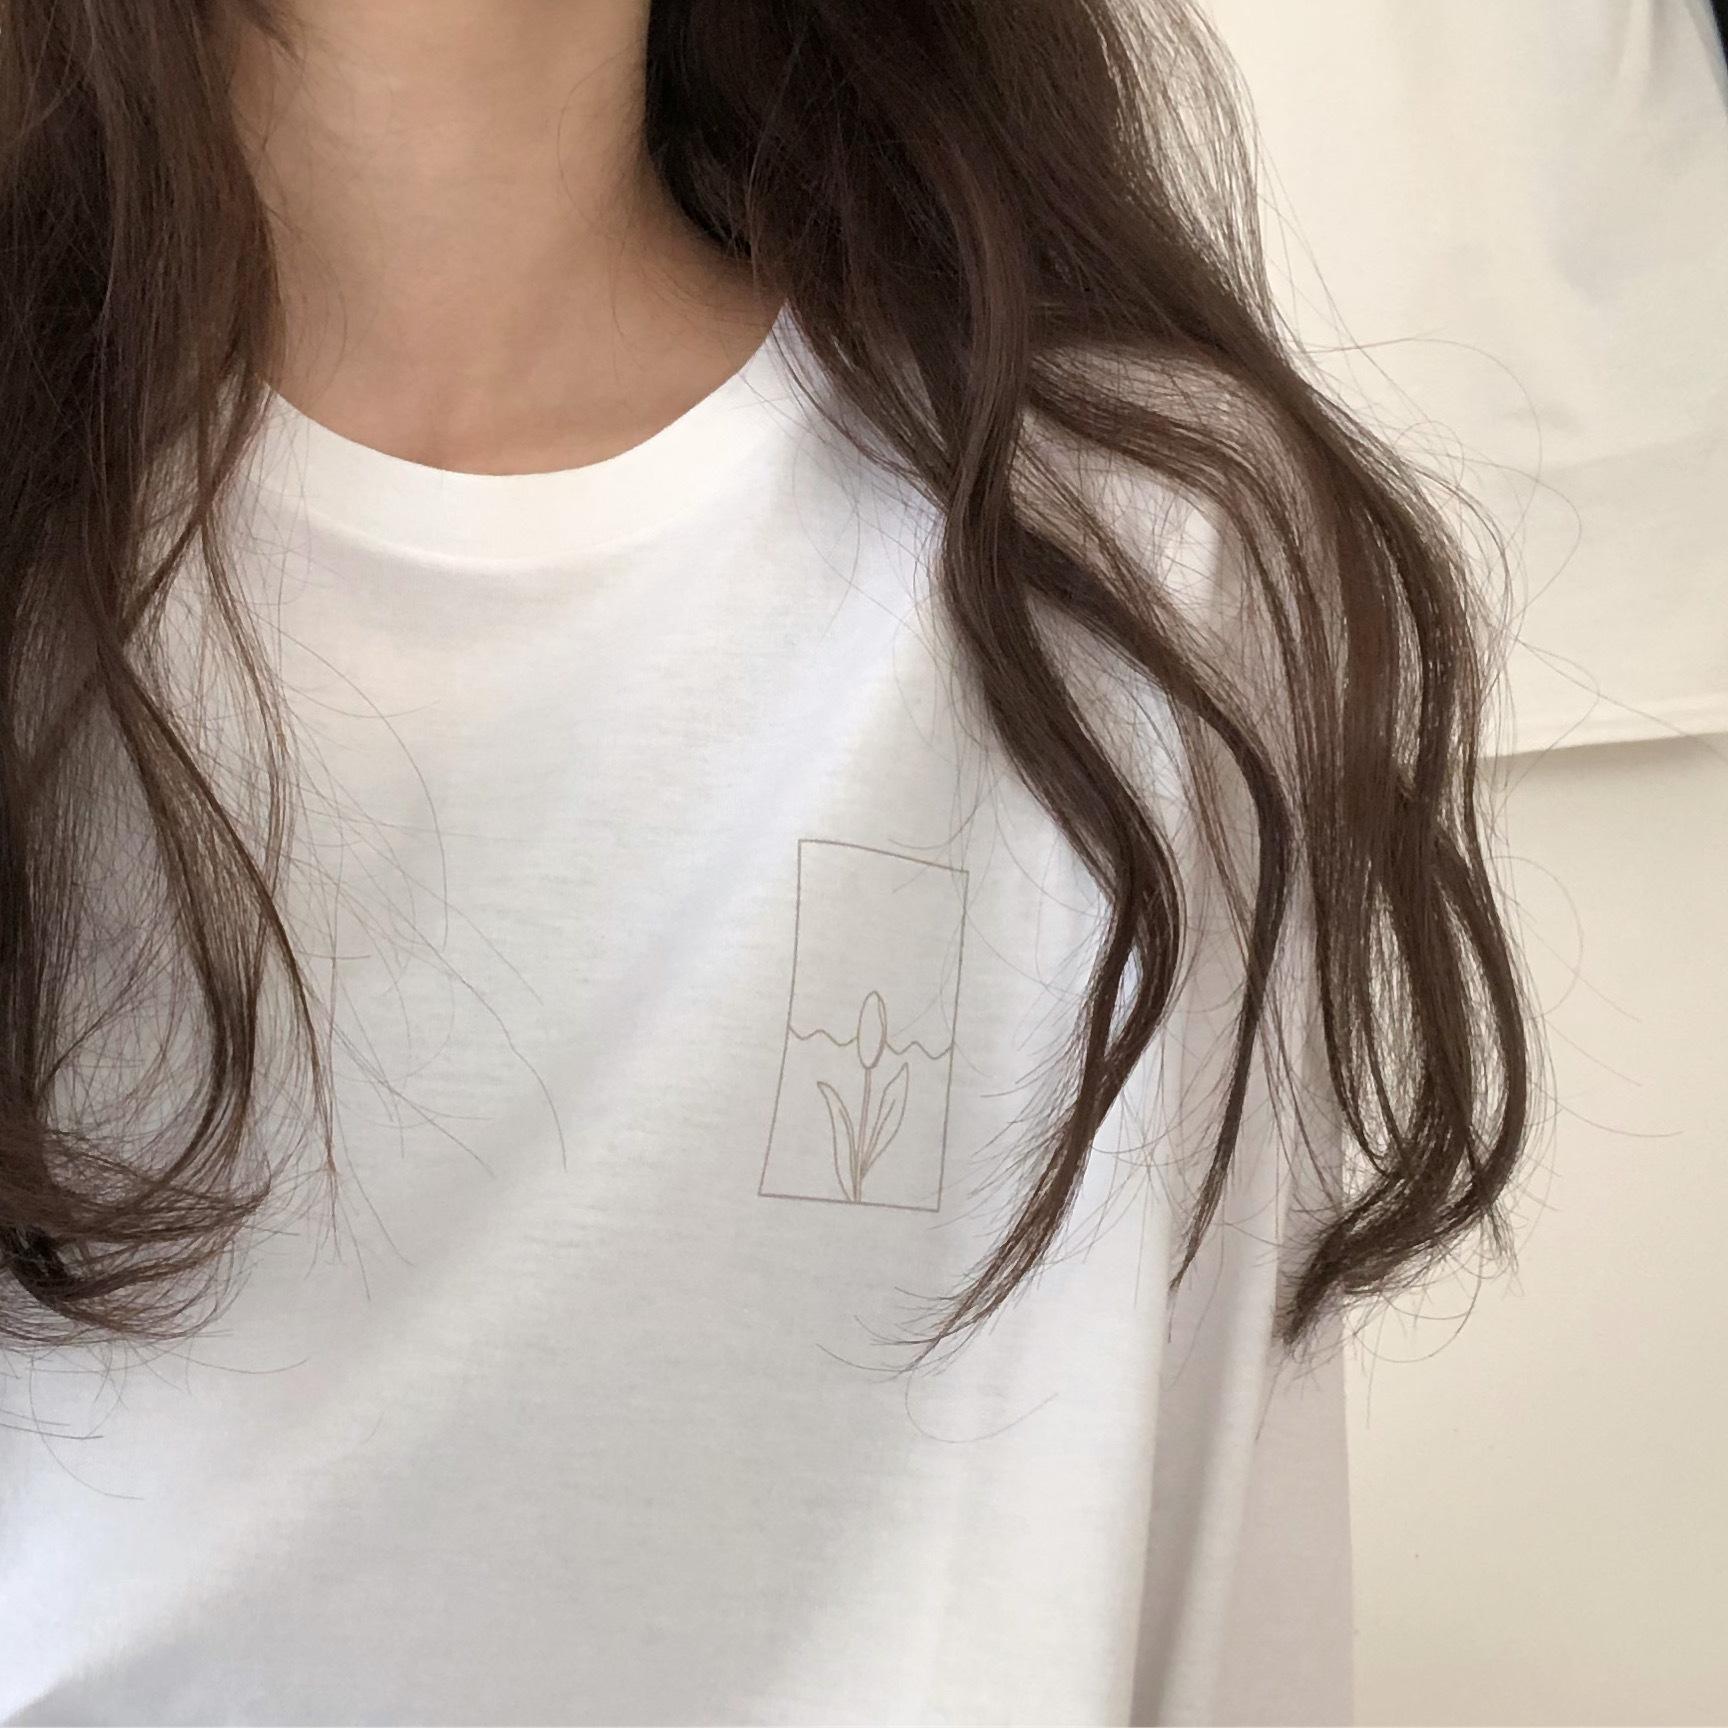 tulip(long sleeve shirt)